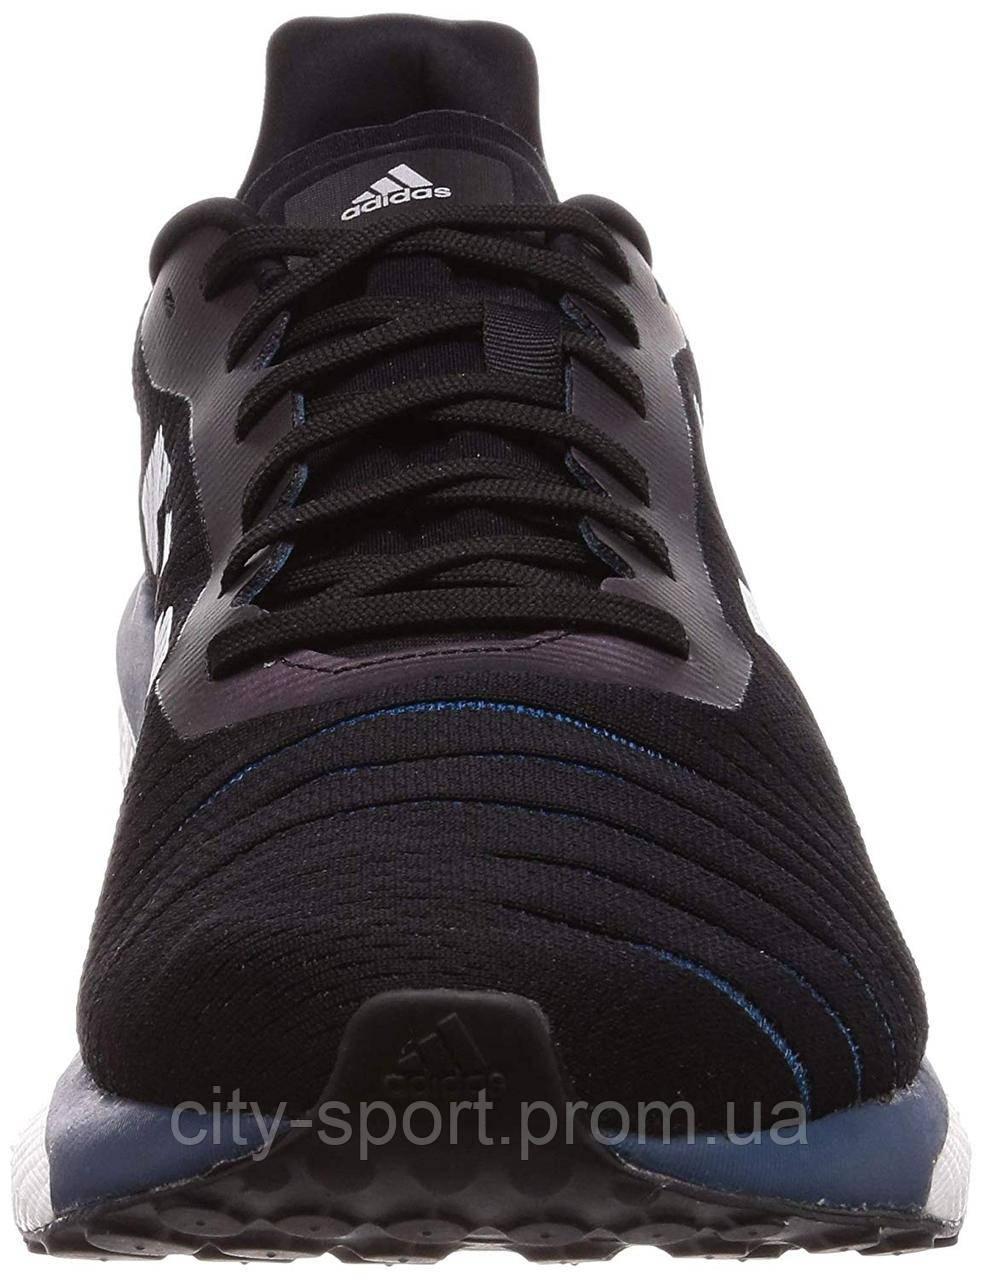 9e126411 Мужские кроссовки для бега adidas Solar Drive D97442, цена 2 995 грн.,  купить в Херсоне — Prom.ua (ID#85389622)